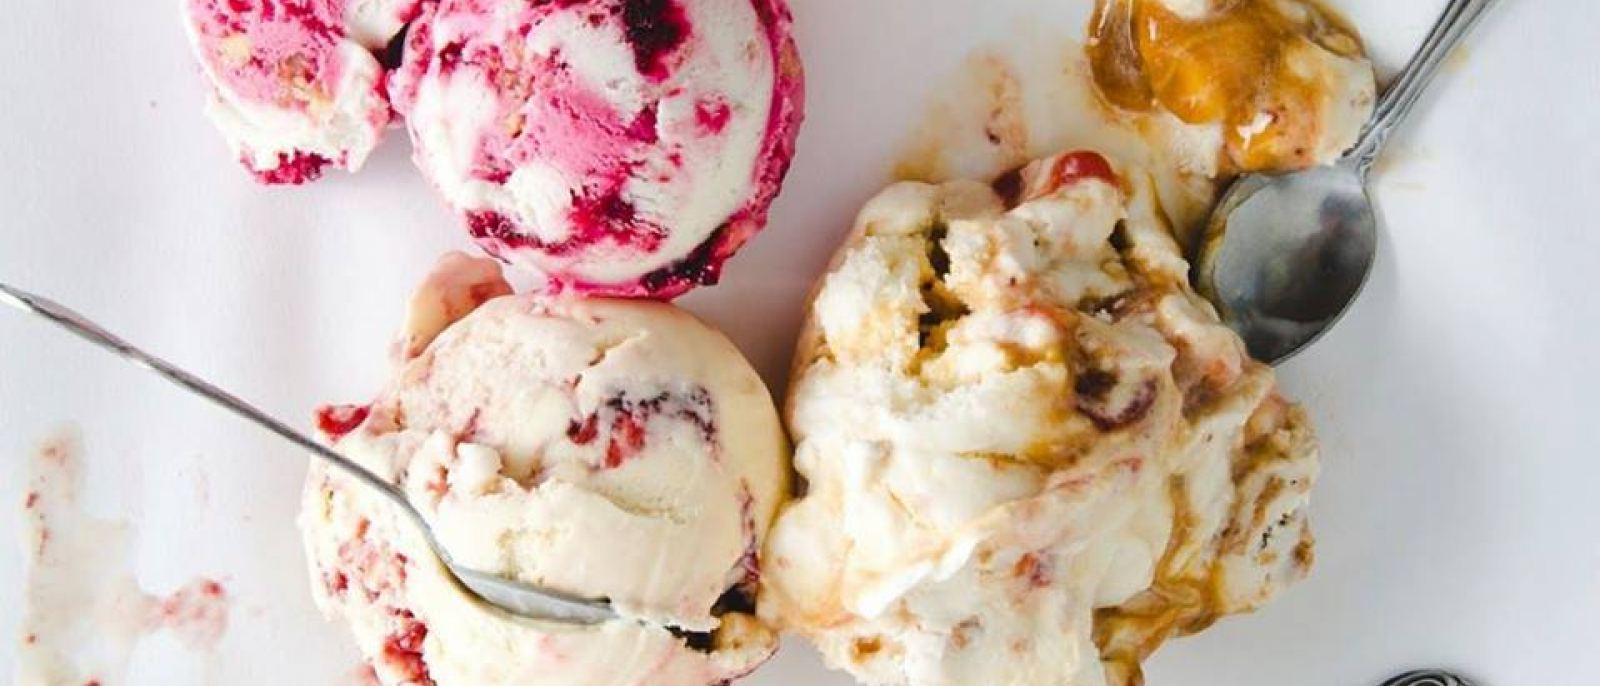 Salt & Straw Ice Cream